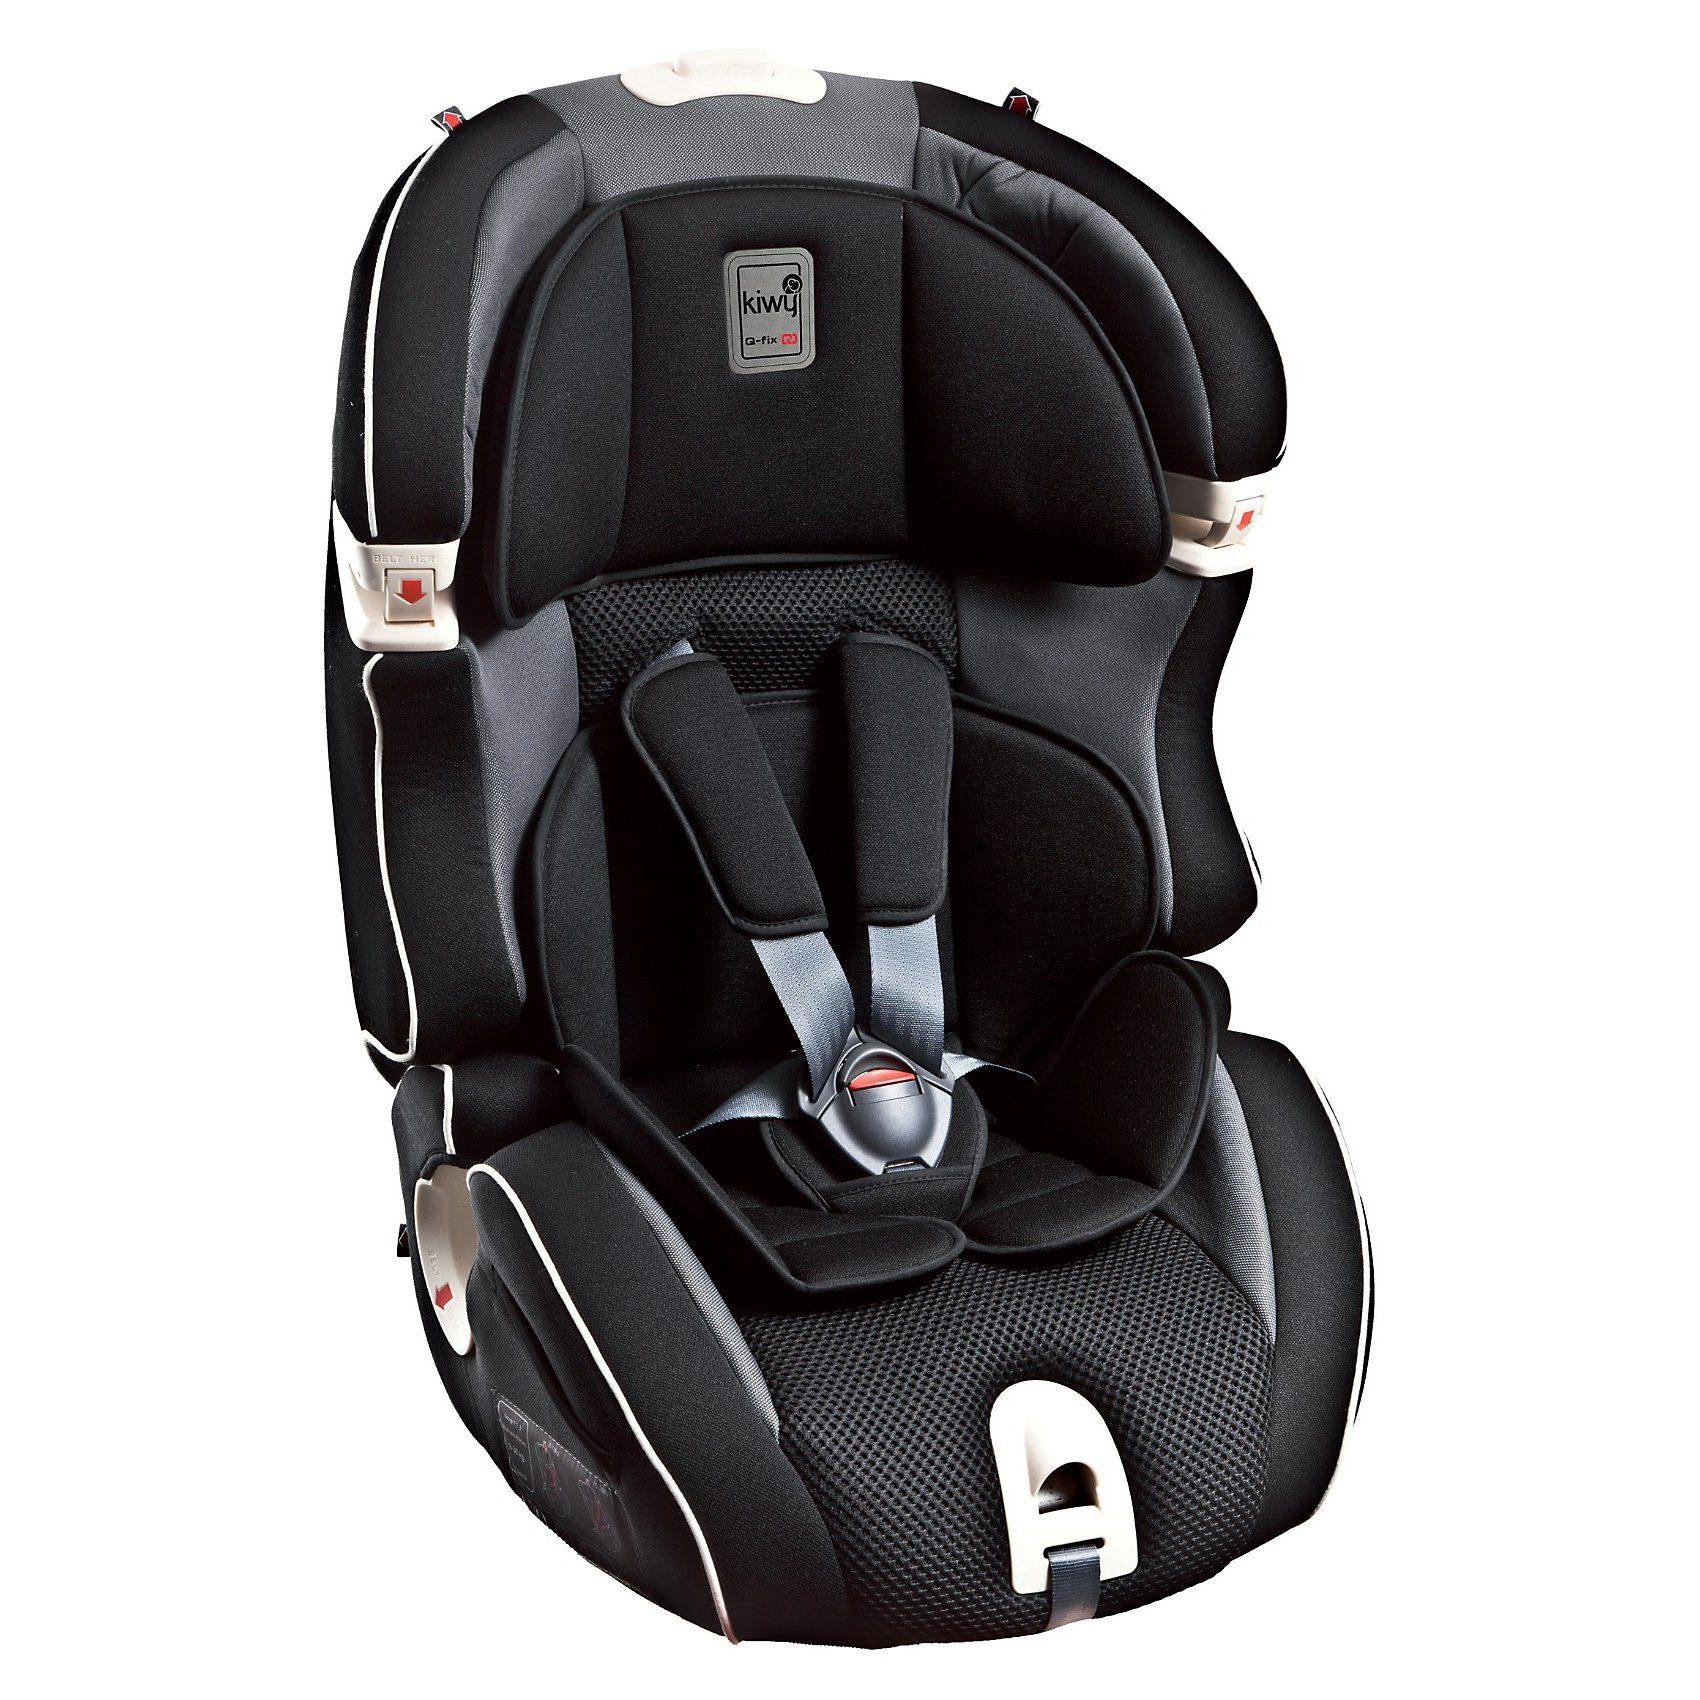 Kiwy Auto-Kindersitz SLF123 Q-Fix, Carbon, 2016